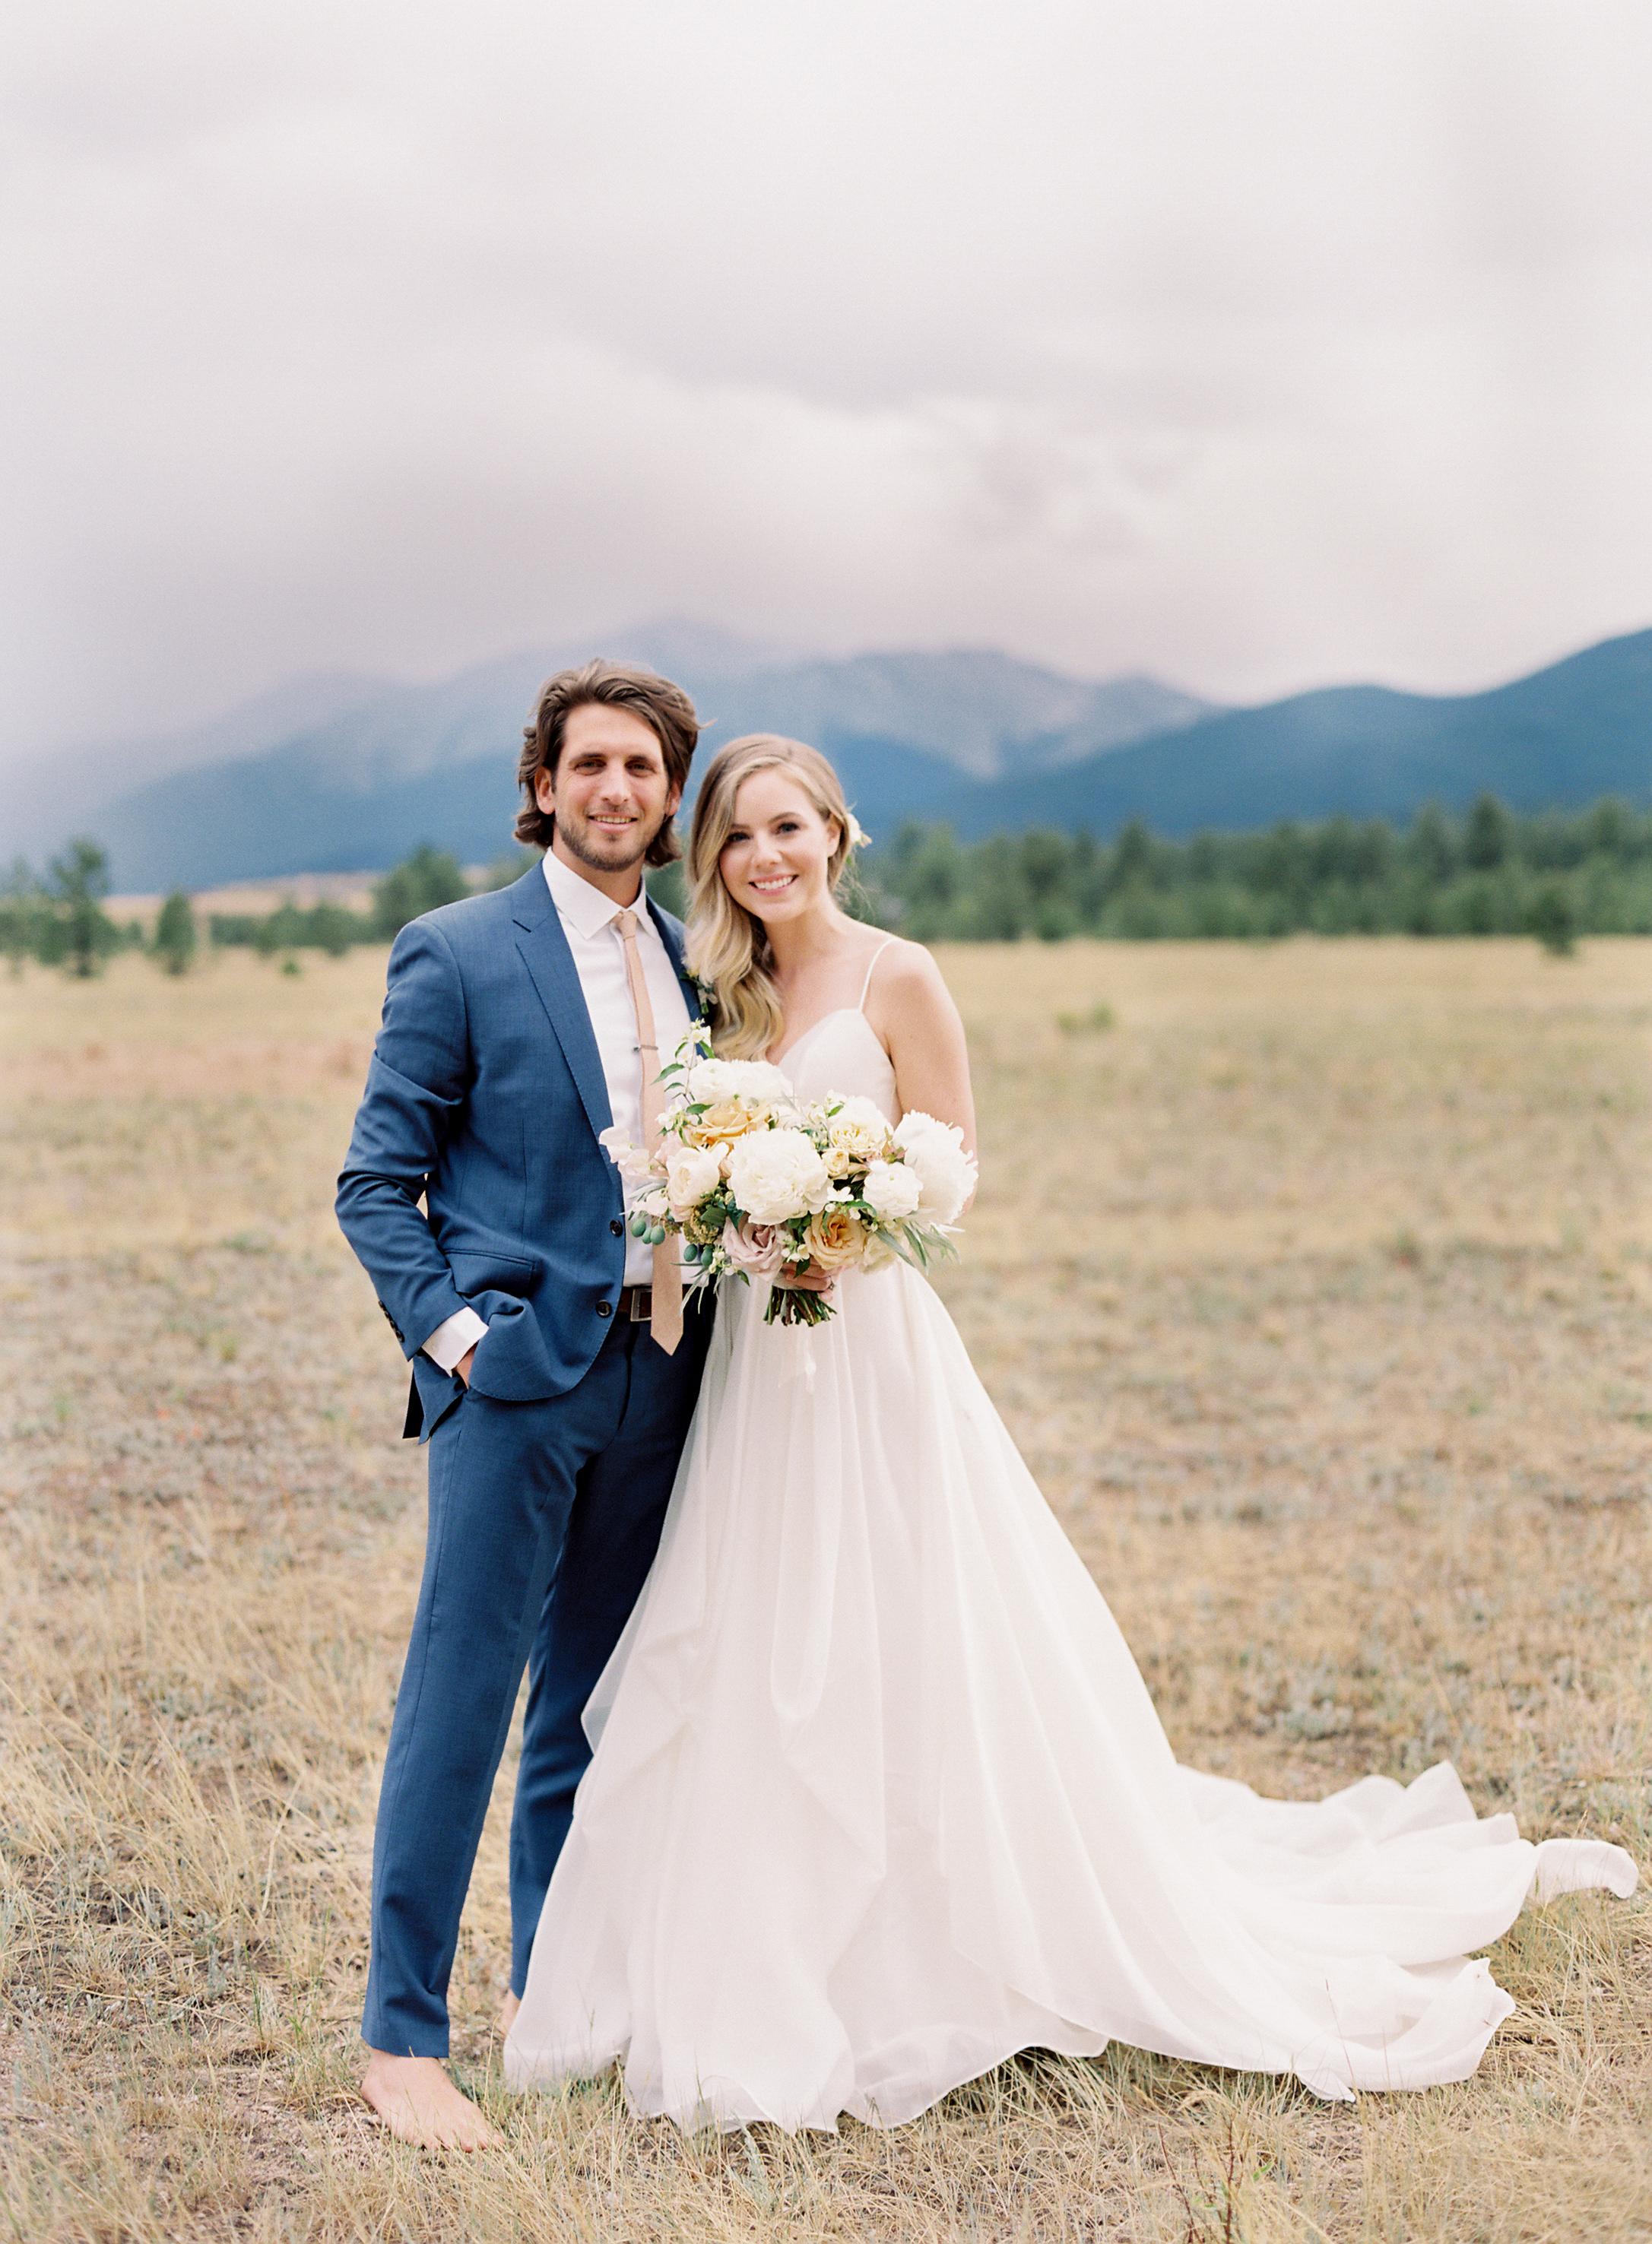 Jessica and Thomas-Wedding-Carrie King Photographer-12.jpg